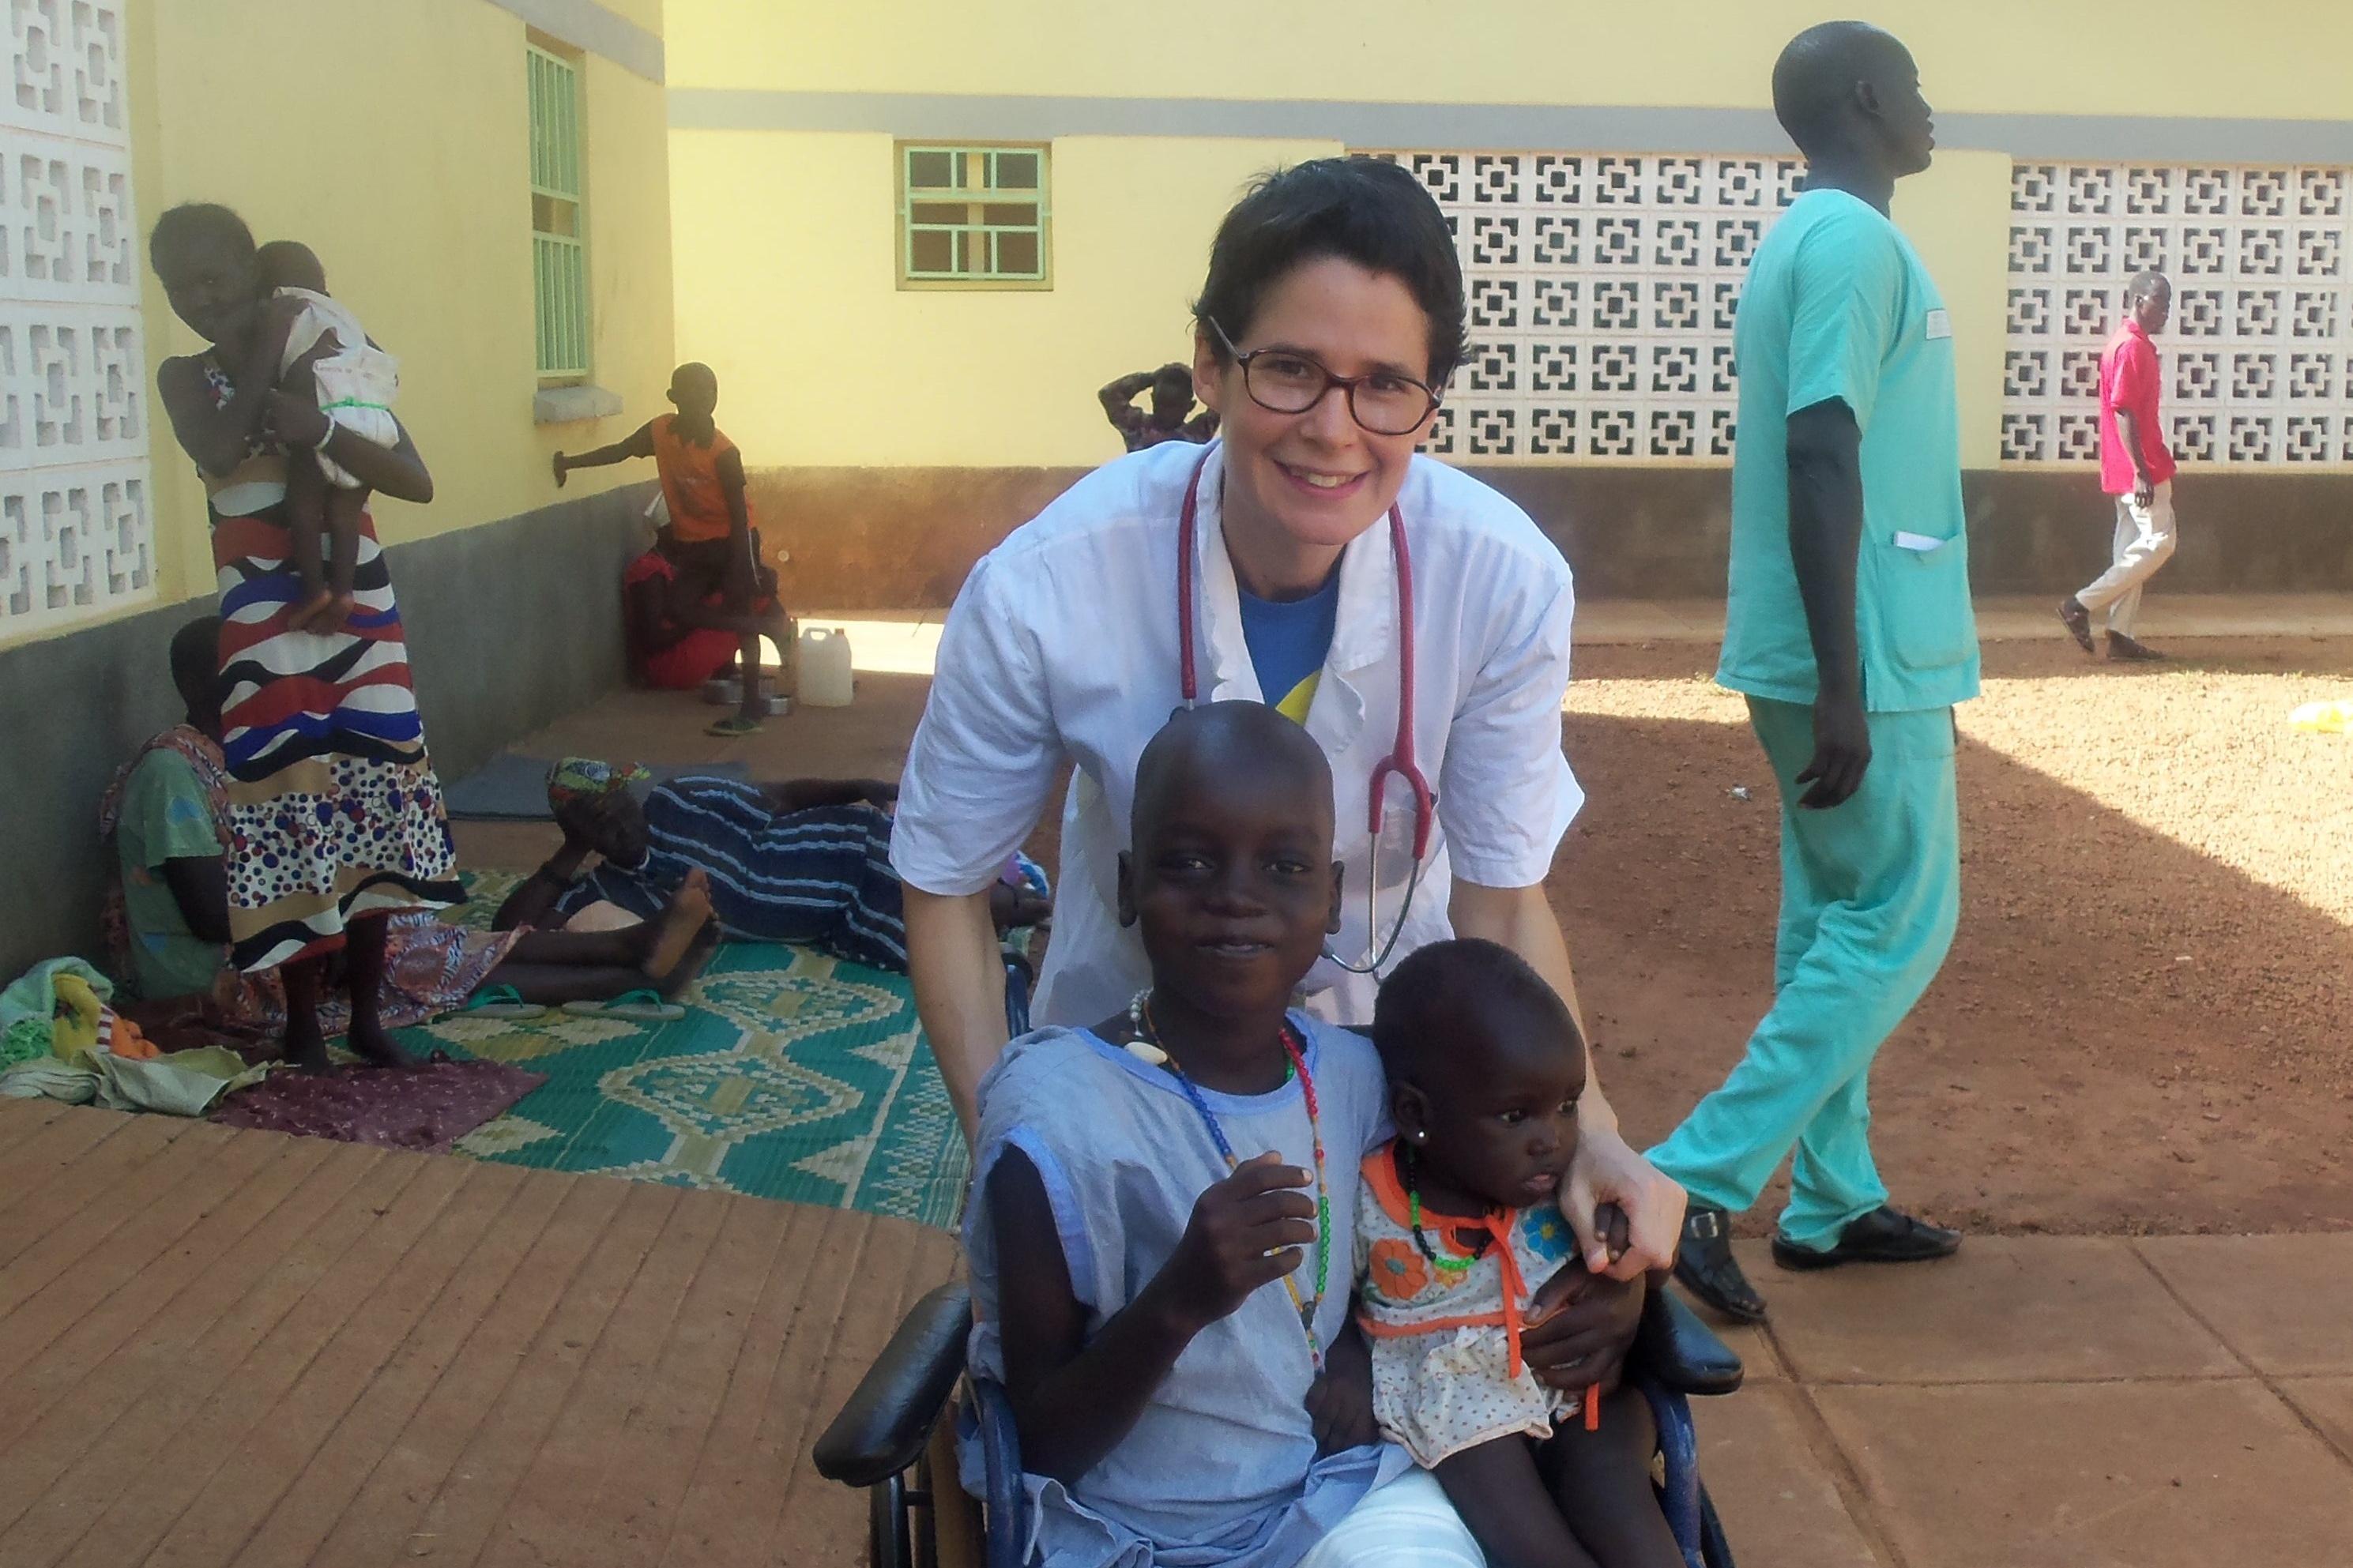 Wau_sudSudan_ospedale Cropped